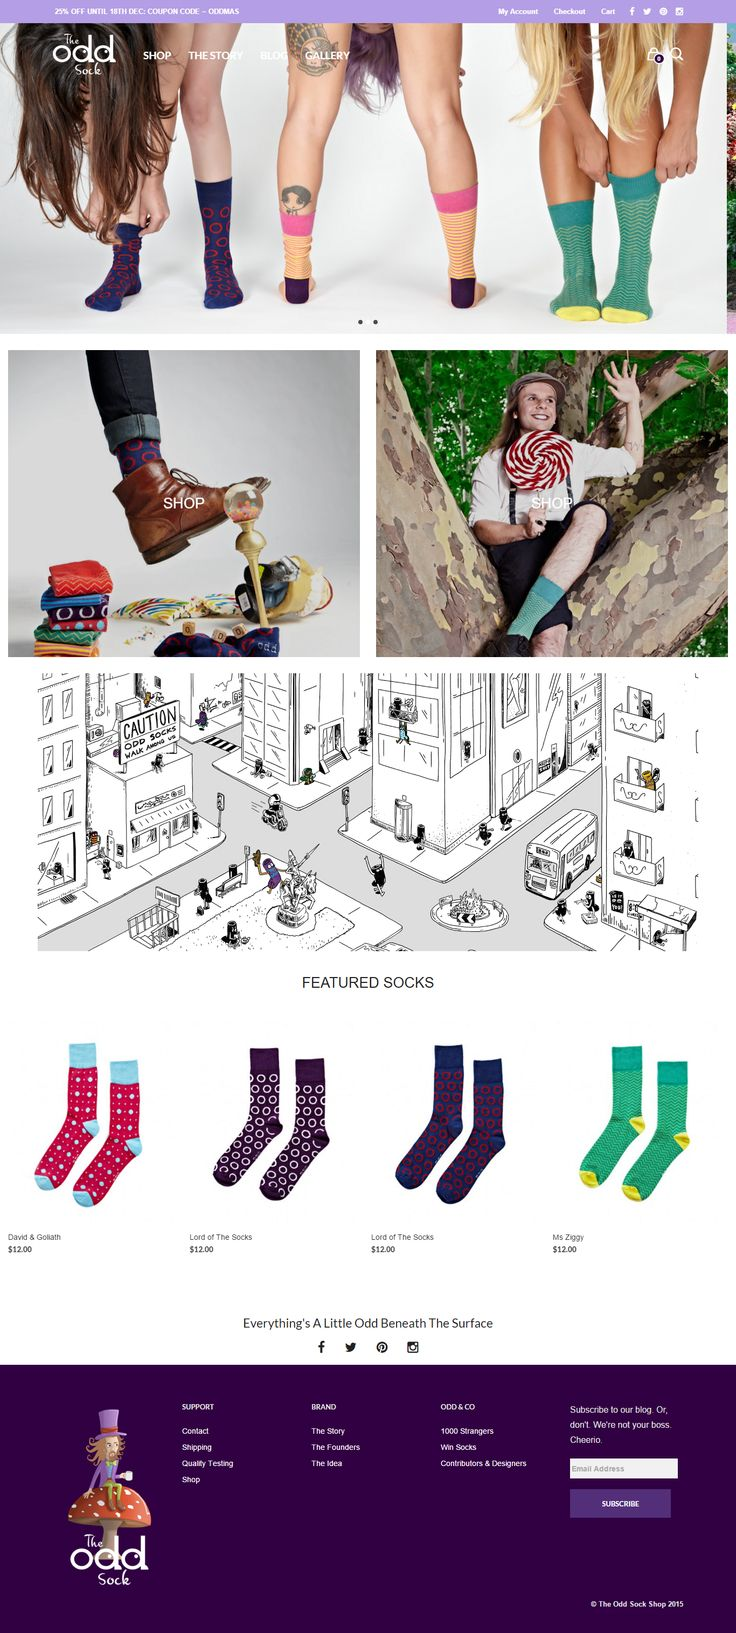 The story of The Odd Sock, powered by Mr Tailor #wptheme http://www.getbowtied.com/customer-stories-sock-company-the-odd-sock/?utm_source=pinterest.com&utm_medium=social&utm_content=odd-sock&utm_campaign=customer-stories #creativesocks #ecommerce #wordpress #bestwebsites #webdesign #templates #onlineshop